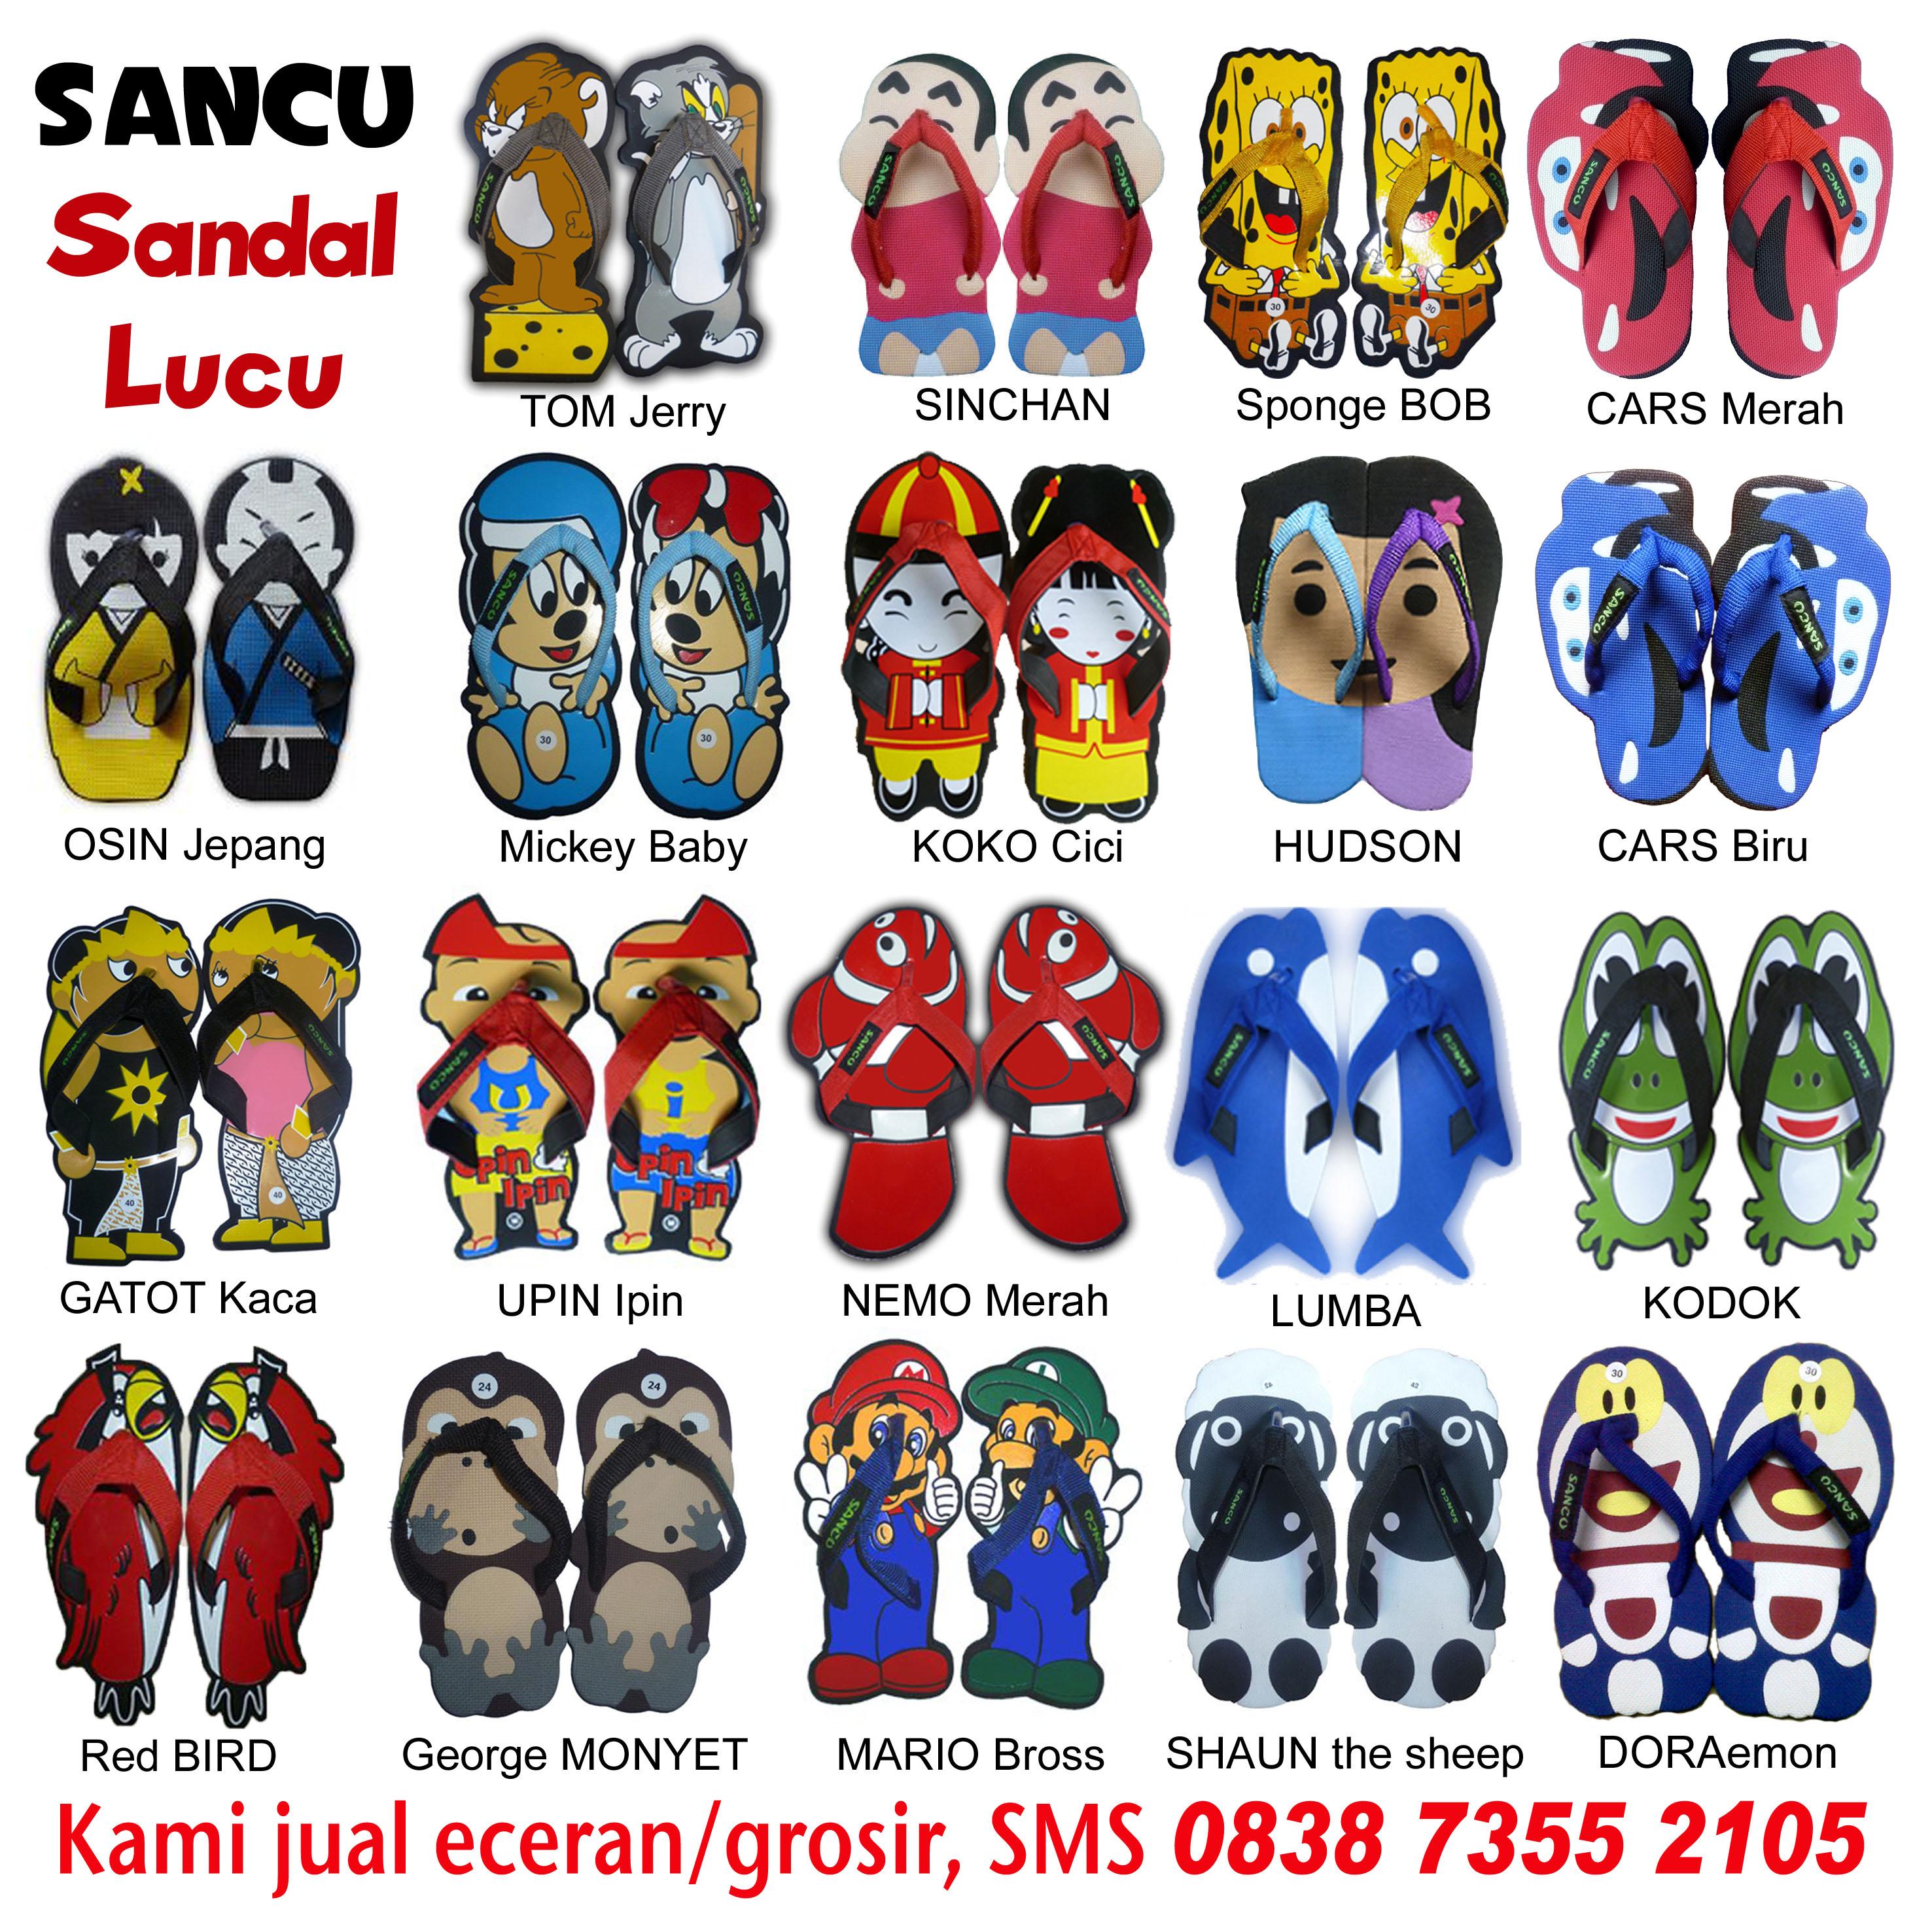 Lucu Jual Sandal SANCU Murah WA 0812 9499 1685